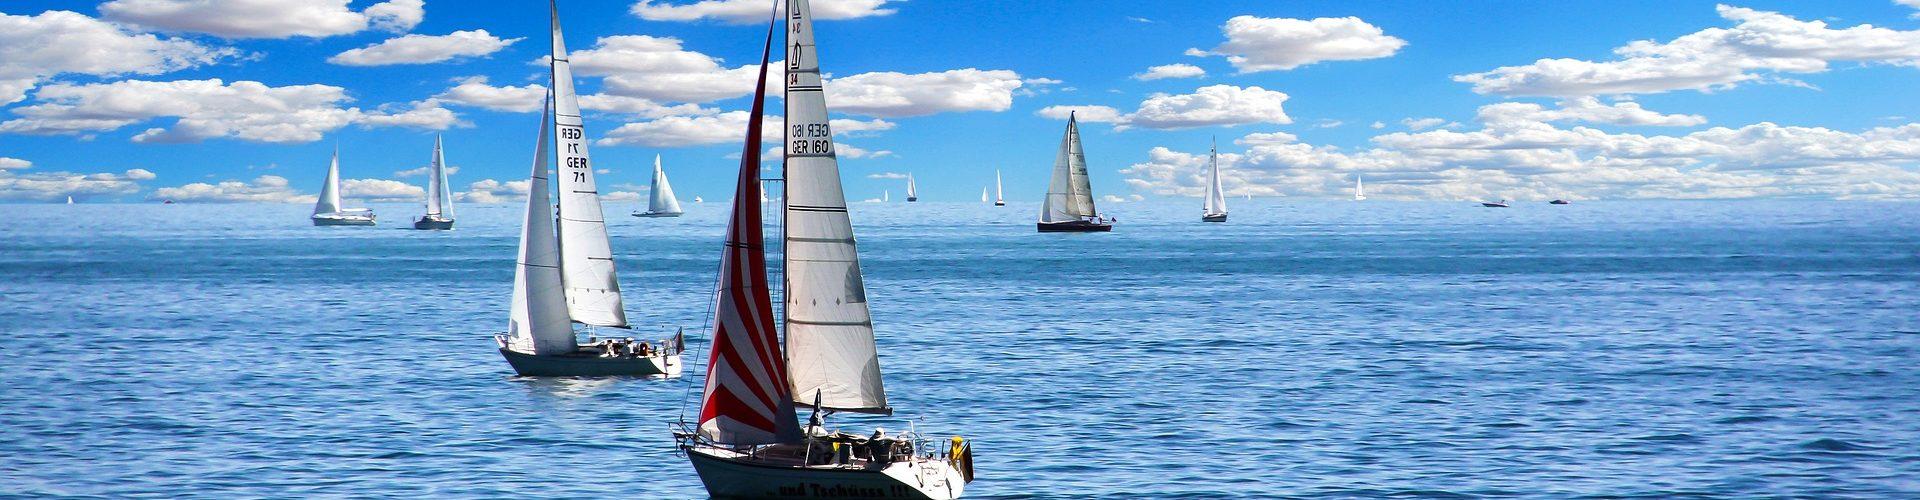 segeln lernen in Uffing am Staffelsee segelschein machen in Uffing am Staffelsee 1920x500 - Segeln lernen in Uffing am Staffelsee